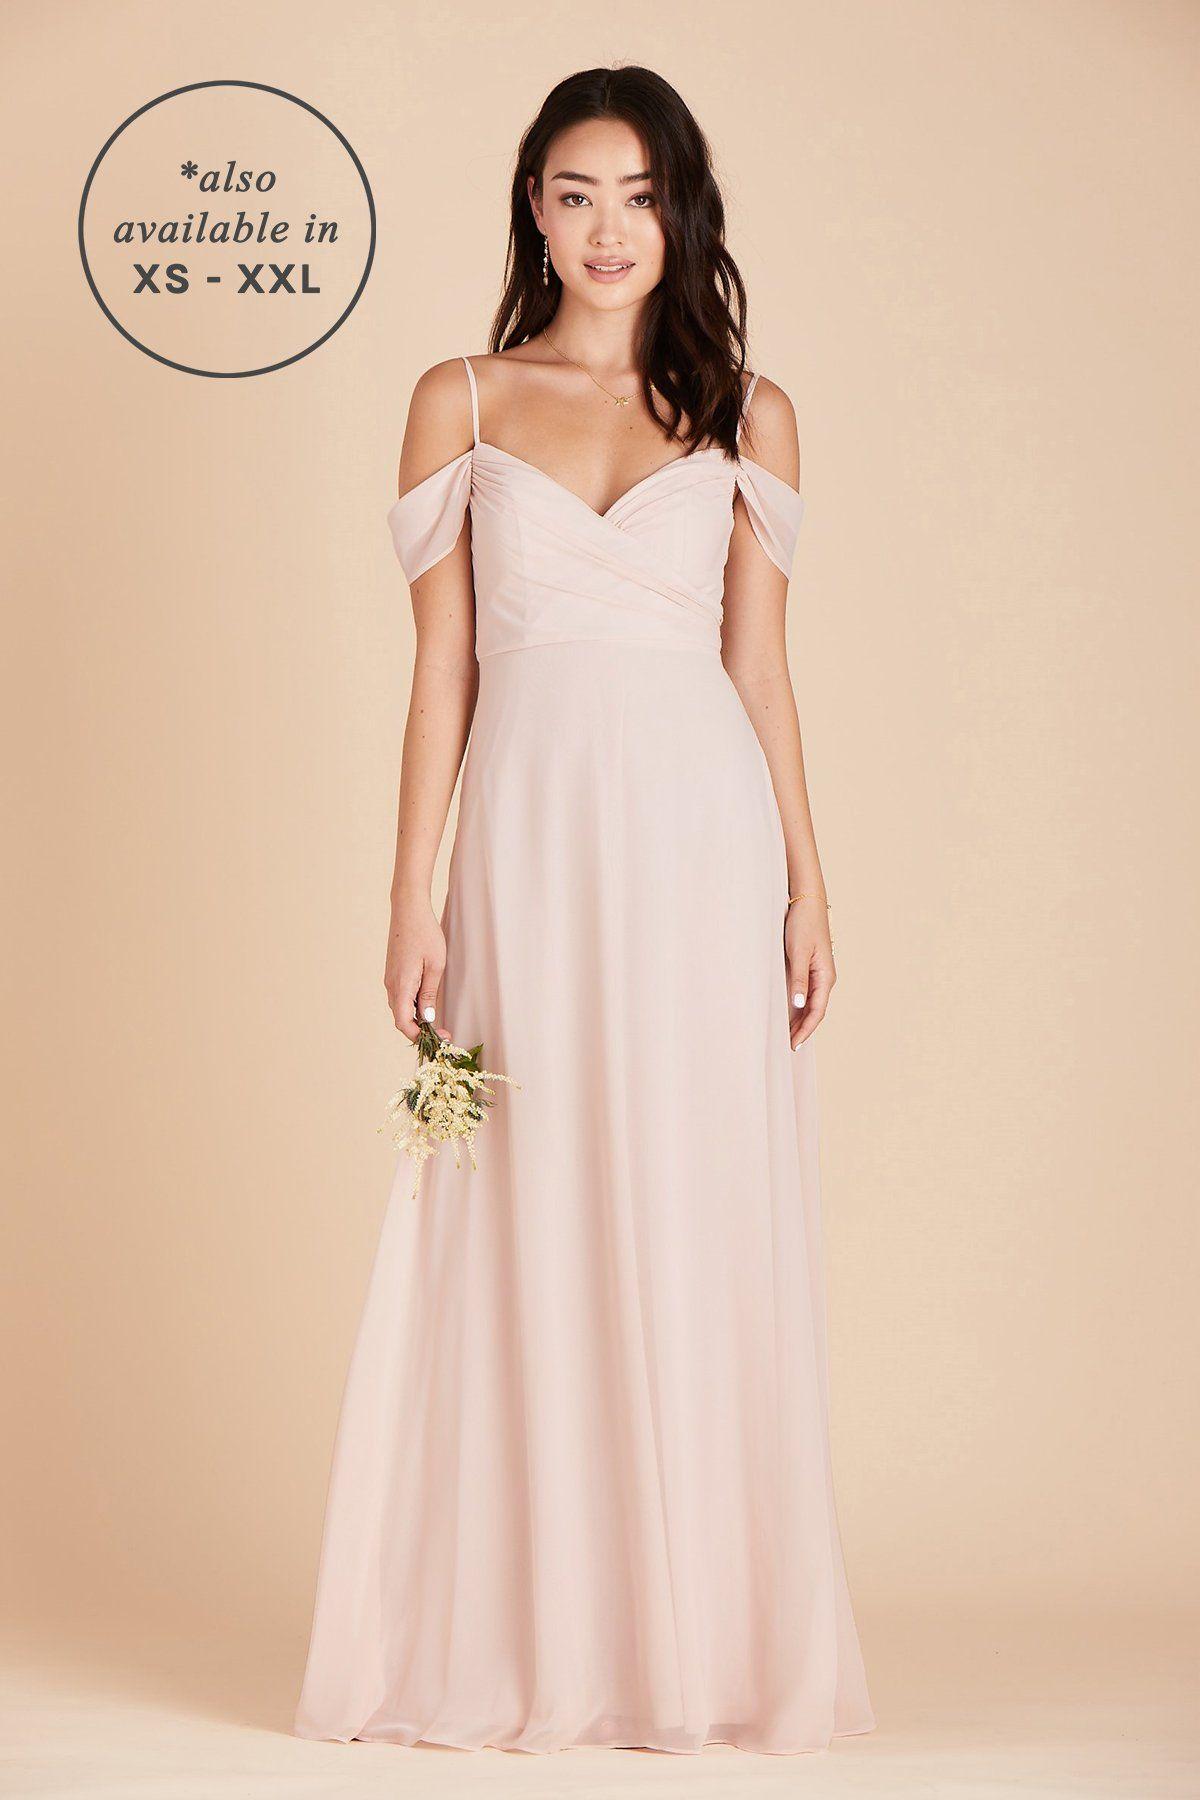 Spence Convertible Dress Curve Pale Blush Flattering Bridesmaid Dresses Blush Bridesmaid Dresses Affordable Bridesmaid Dresses [ 1800 x 1200 Pixel ]